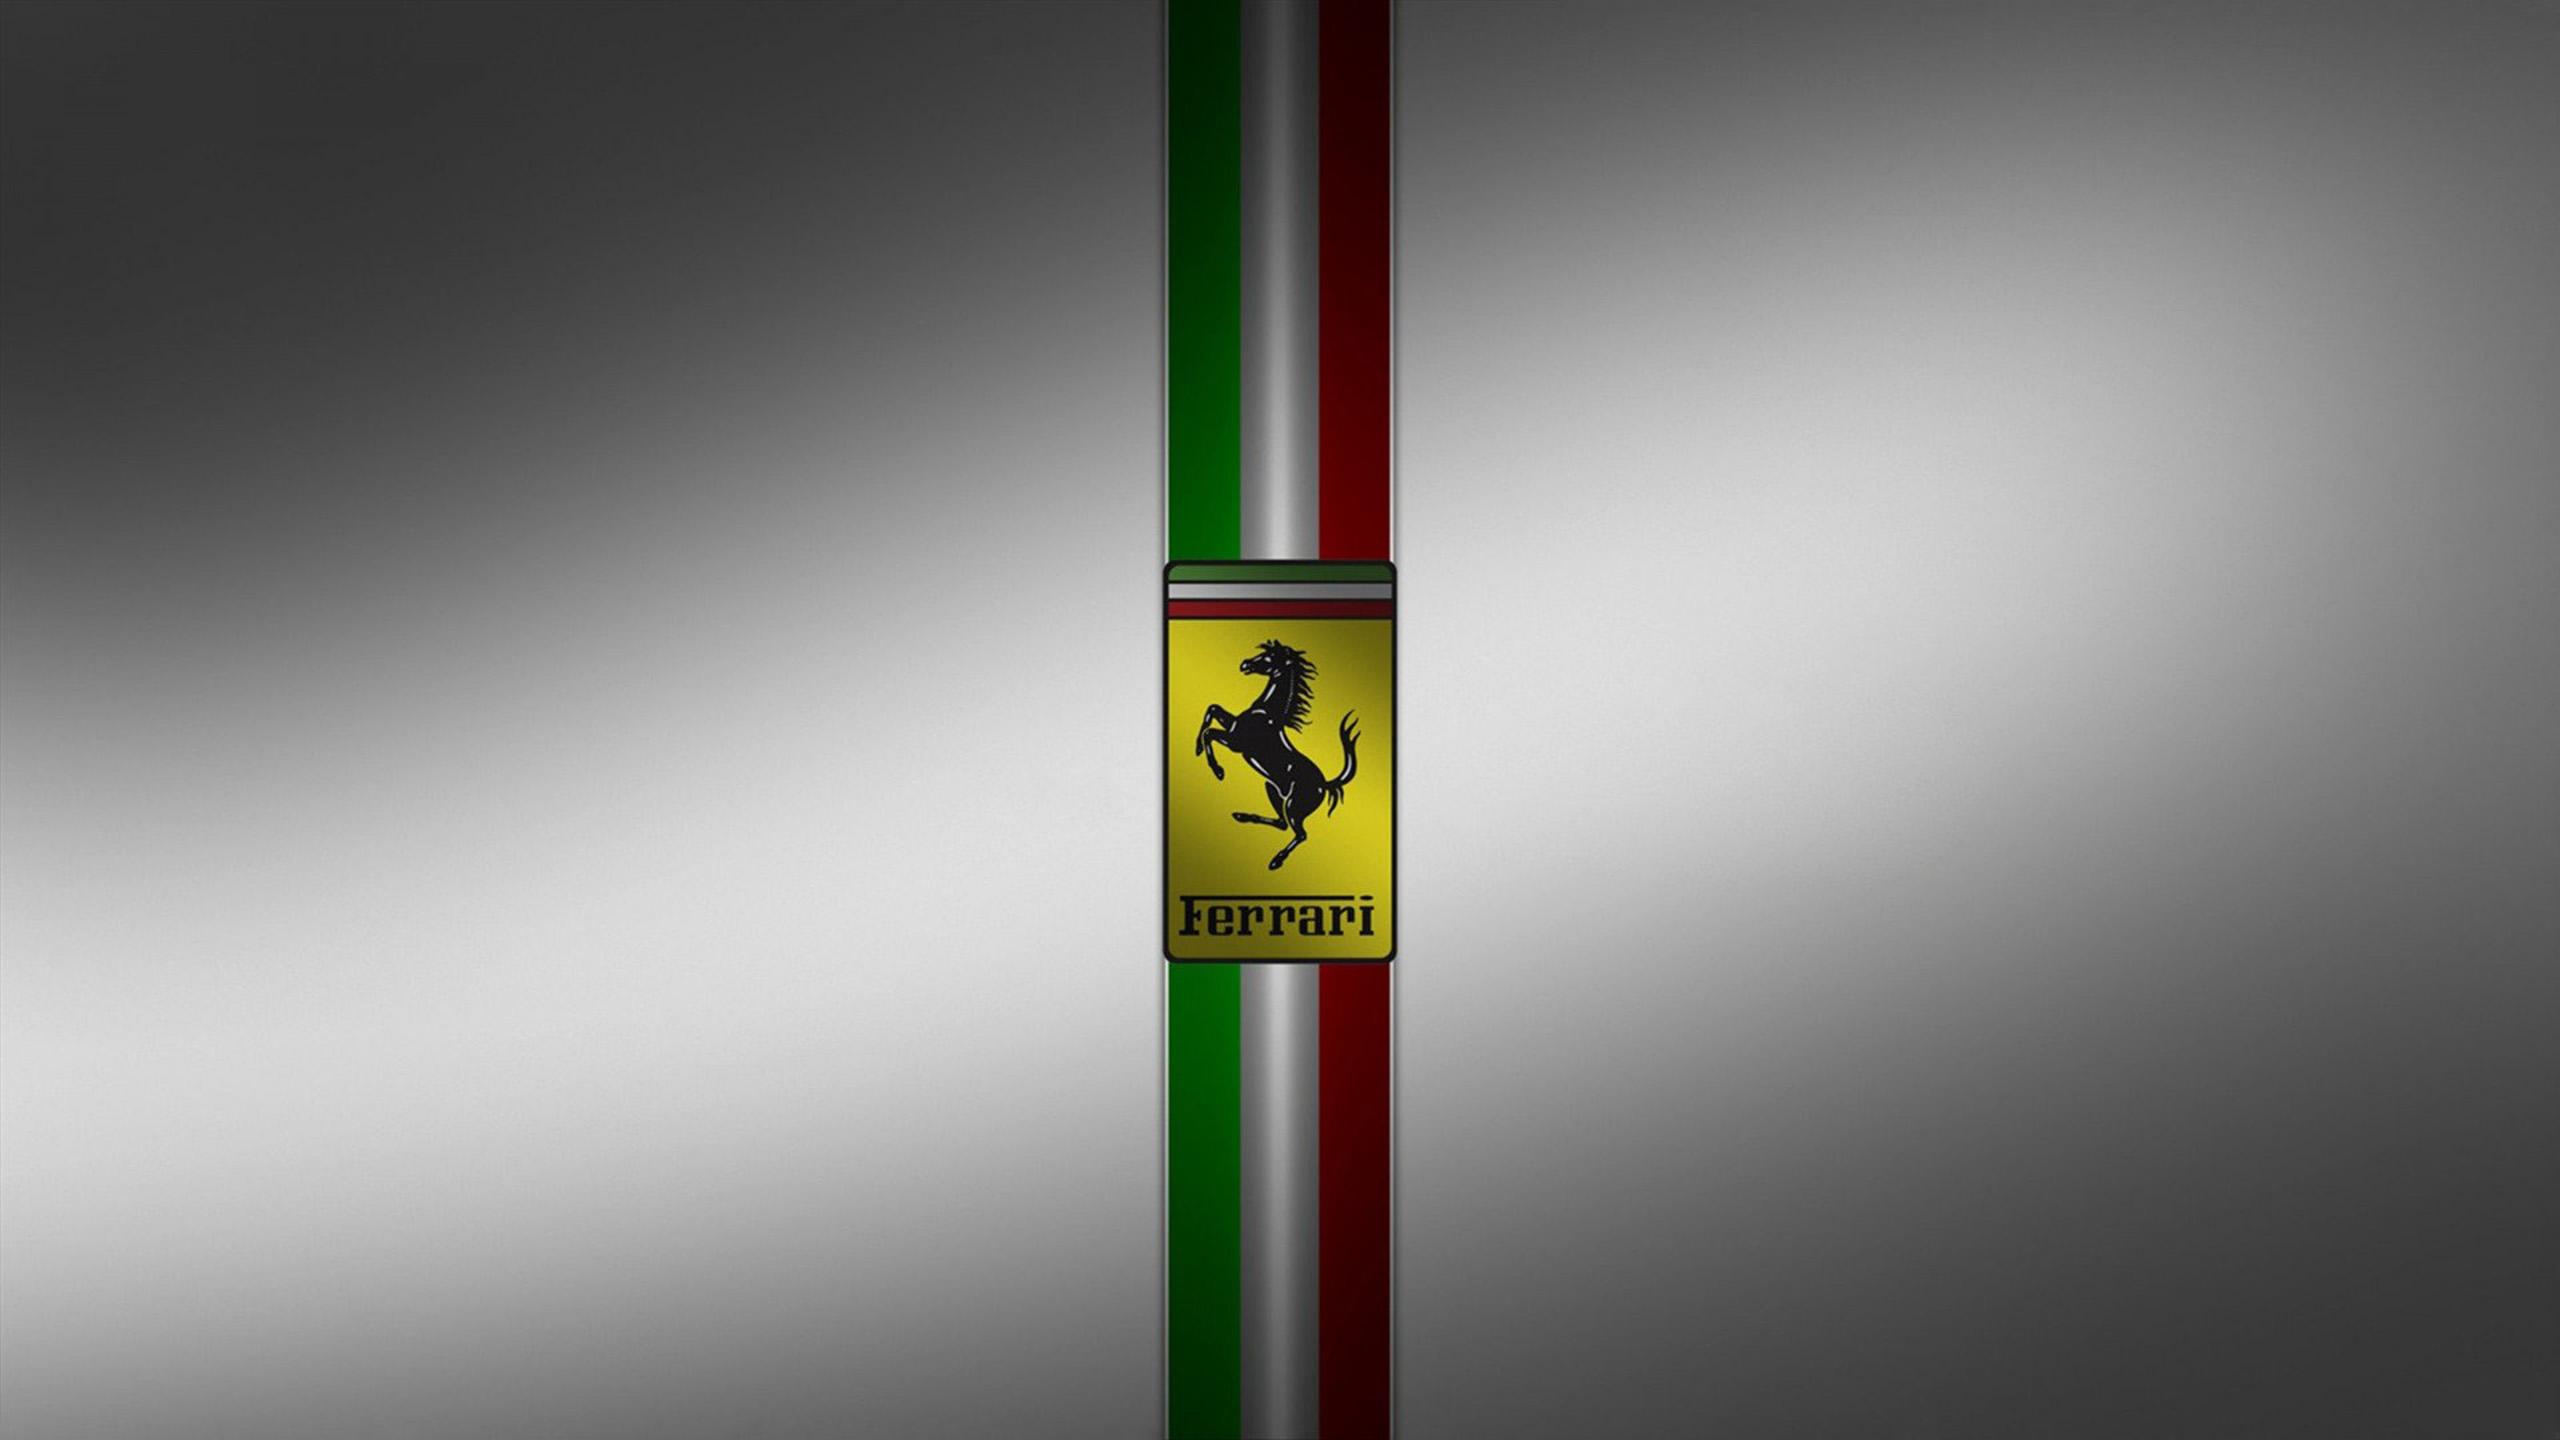 Download Ferrari Logo Wallpaper Hd 2560x1440 76 Ferrari Logo